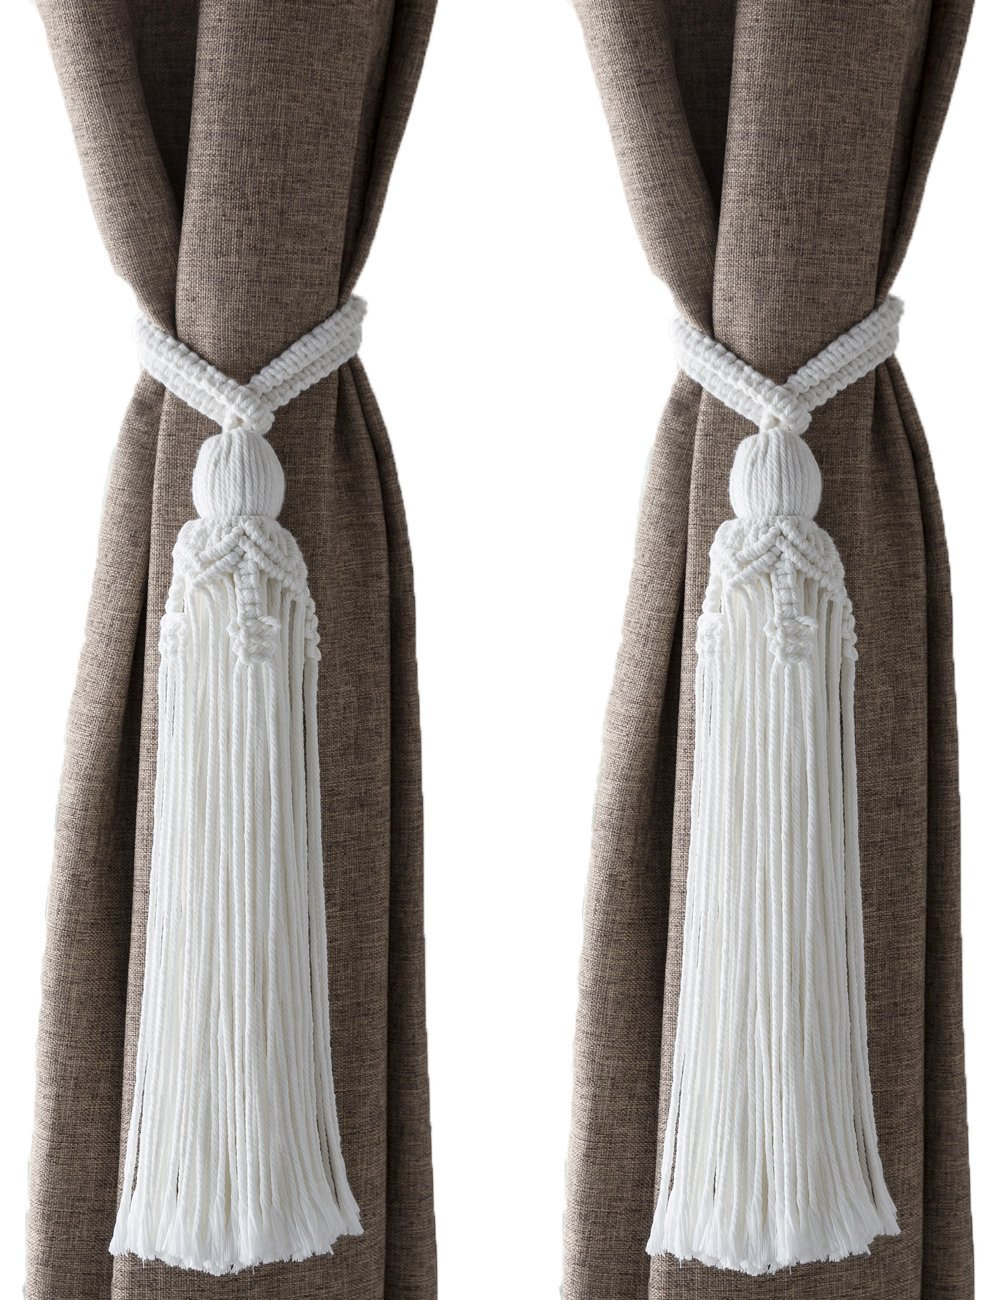 Mkono Macrame Curtain Tiebacks Window Treatment Holdbacks Drapery Boho Decor Tassel White Cotton Rope, Set of 2